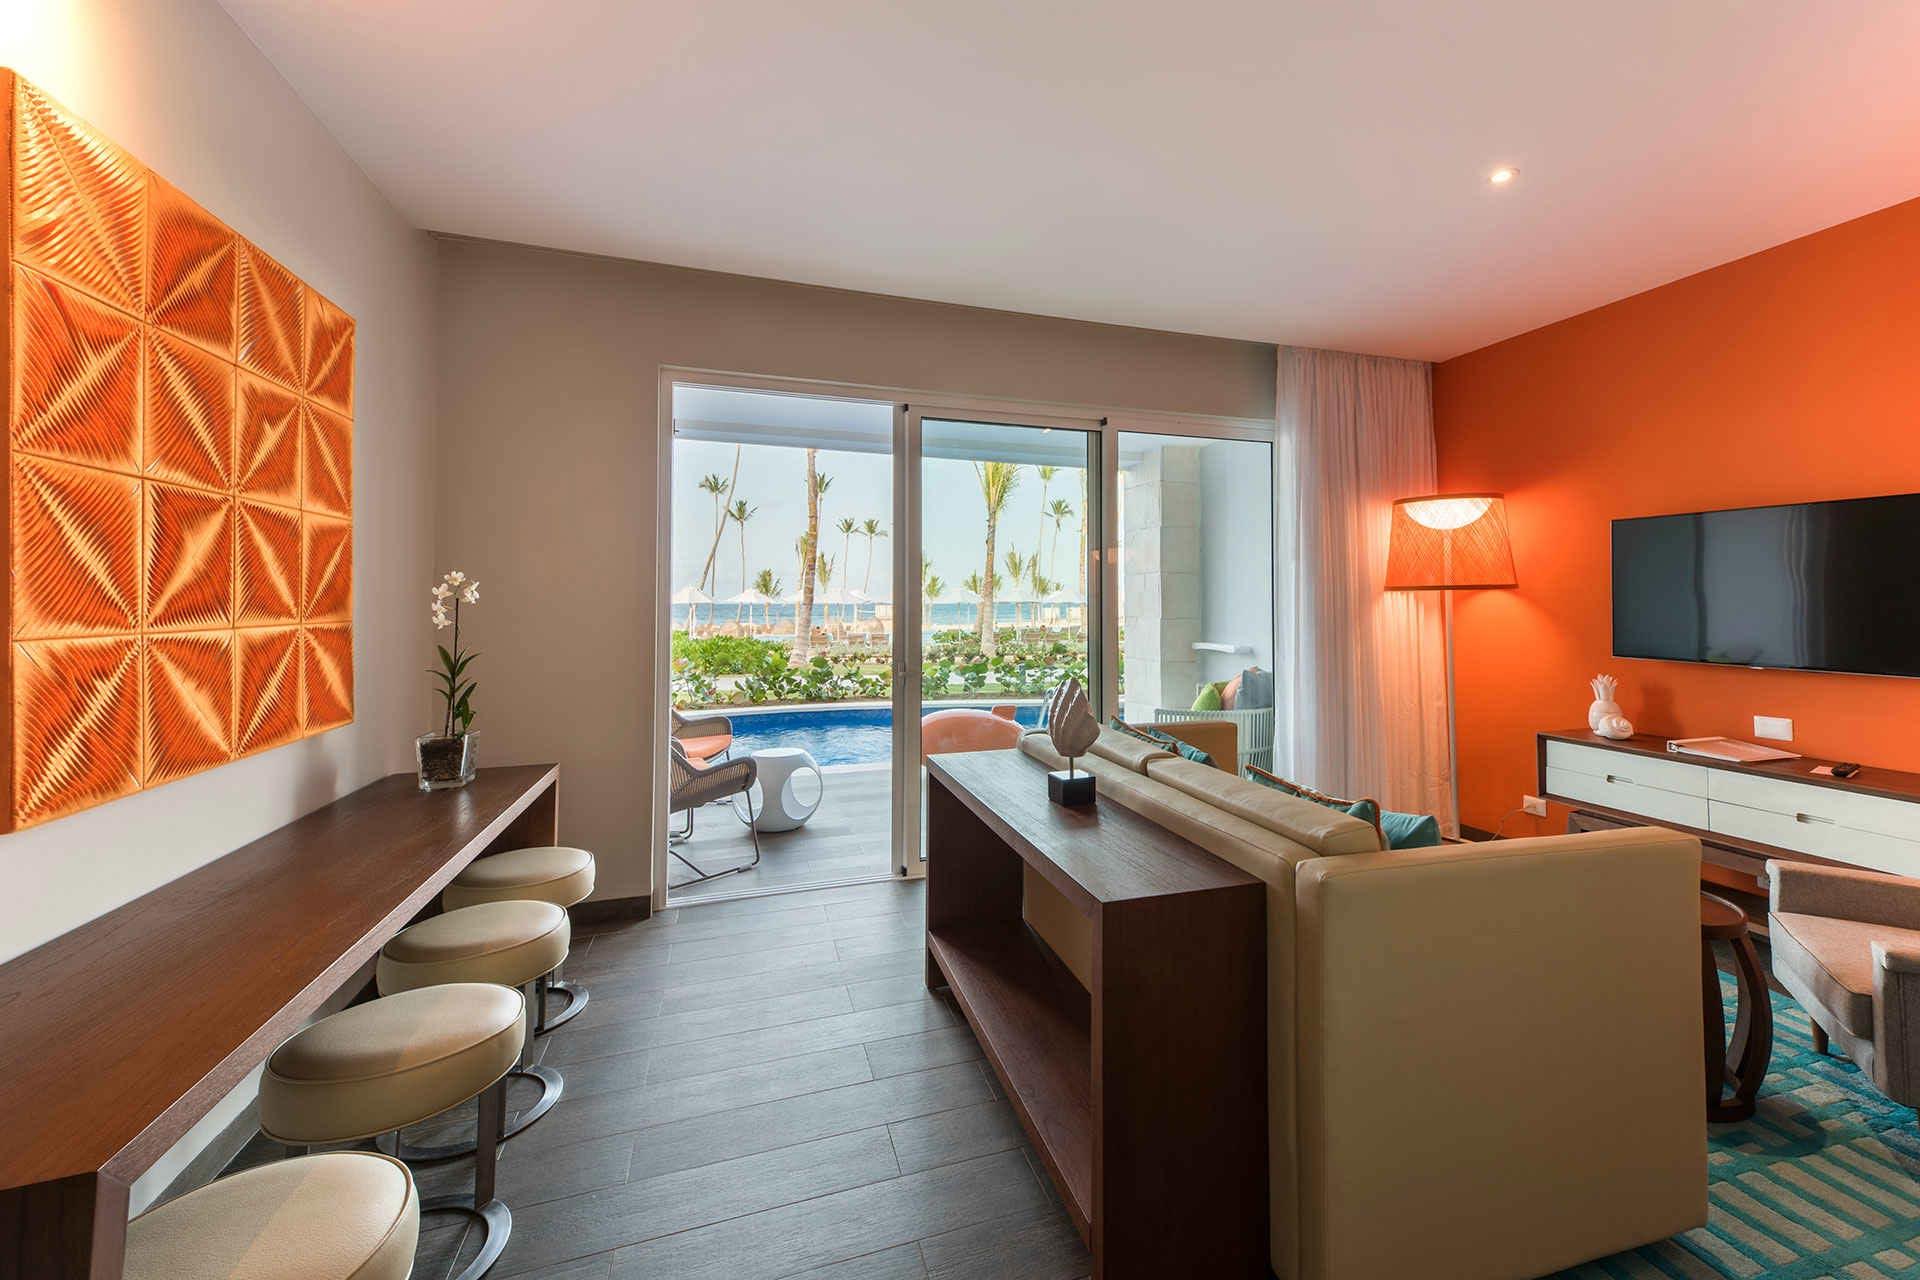 Nickelodeon Hotels & Resorts Punta Cana in the Dominican Republic; Courtesy of Nickelodeon Hotels & Resorts Punta Cana